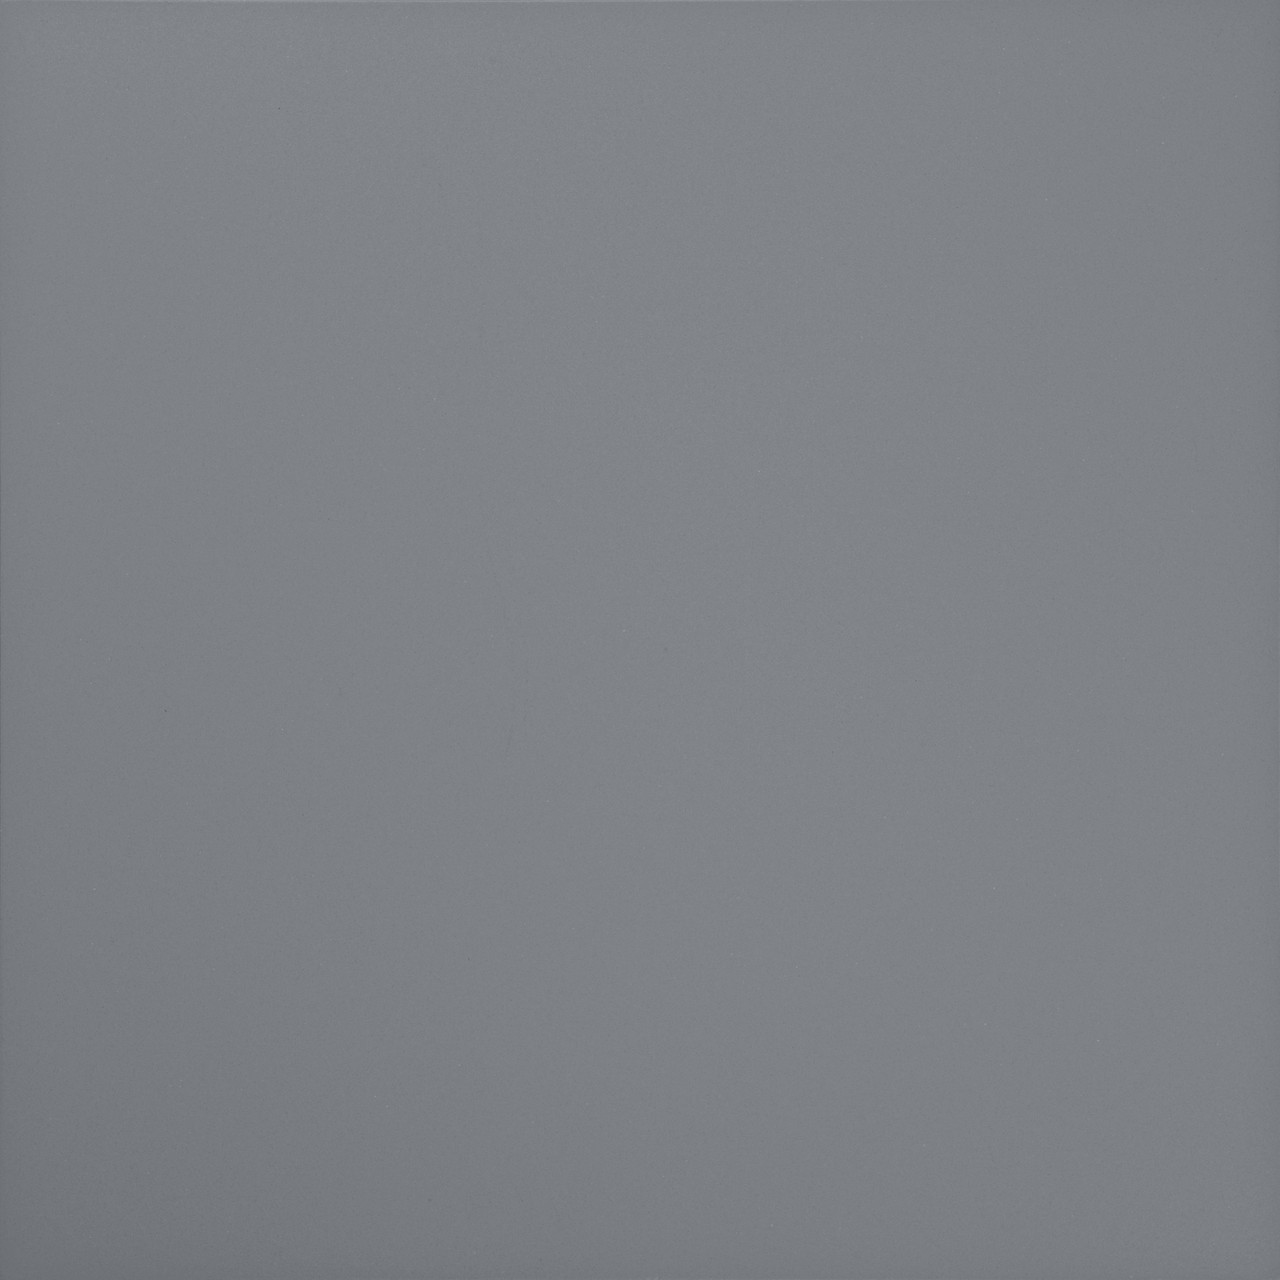 Плитка для пола ГРЕС 12 мм MN 060 200x200 /48